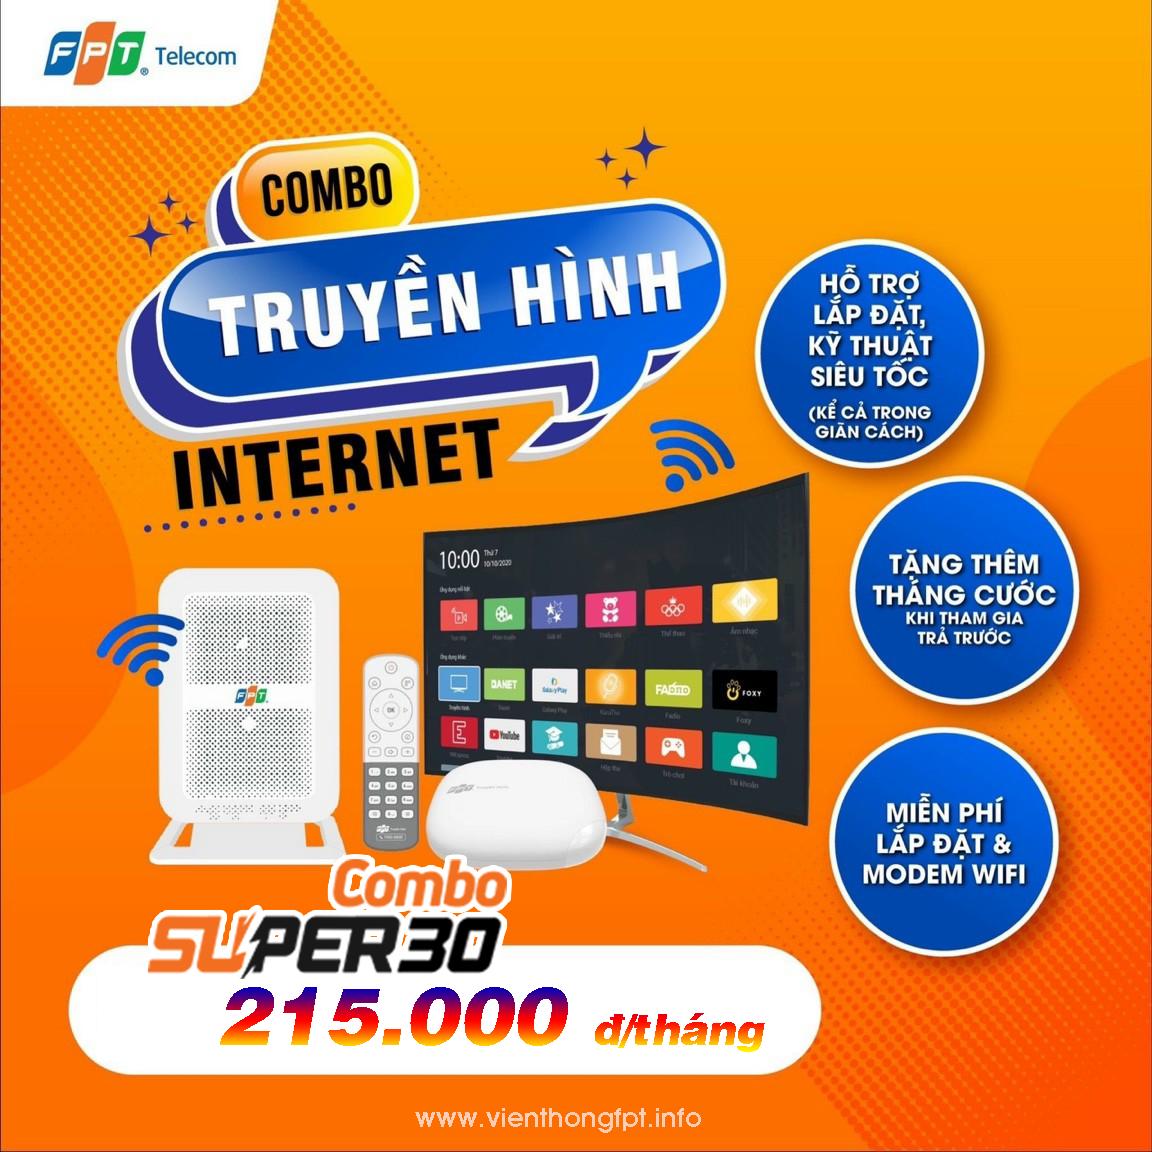 Combo Truyền hình FPT + Internet 30Mbps